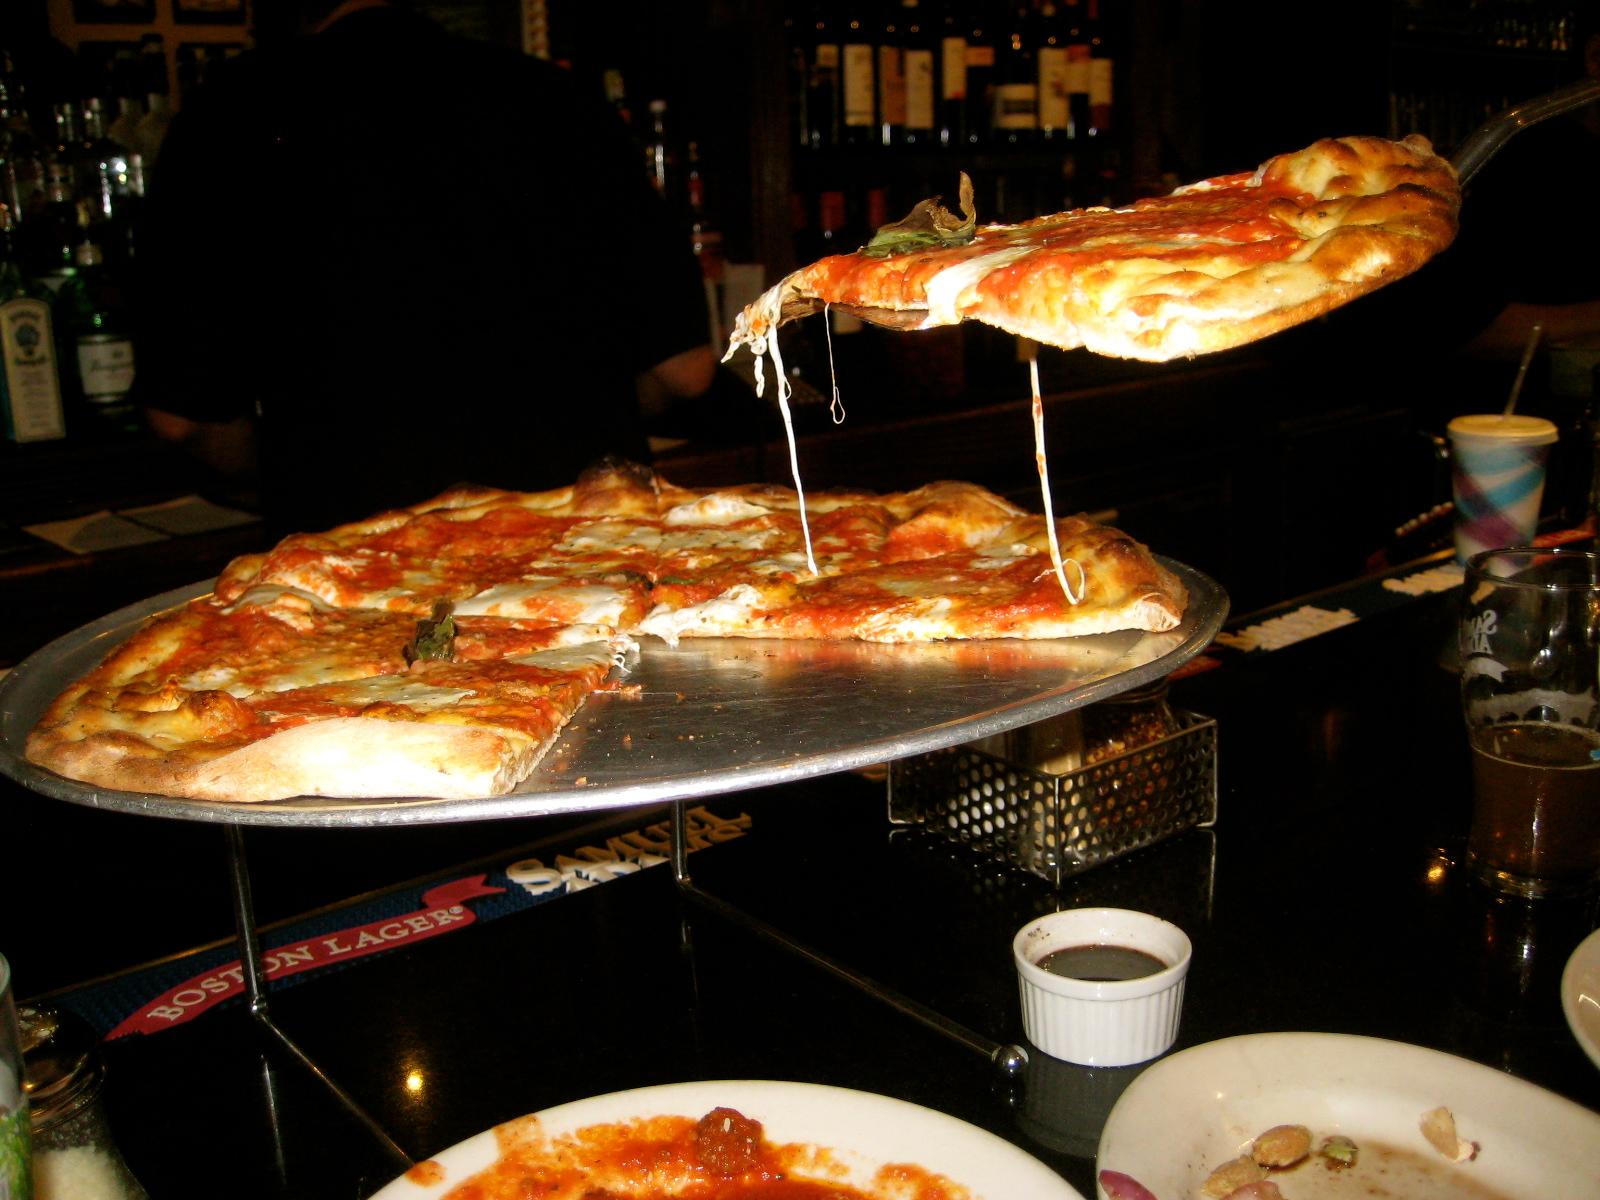 Food D Love Grimaldi 39 S Pizza Garden City Ny: garden city pizza